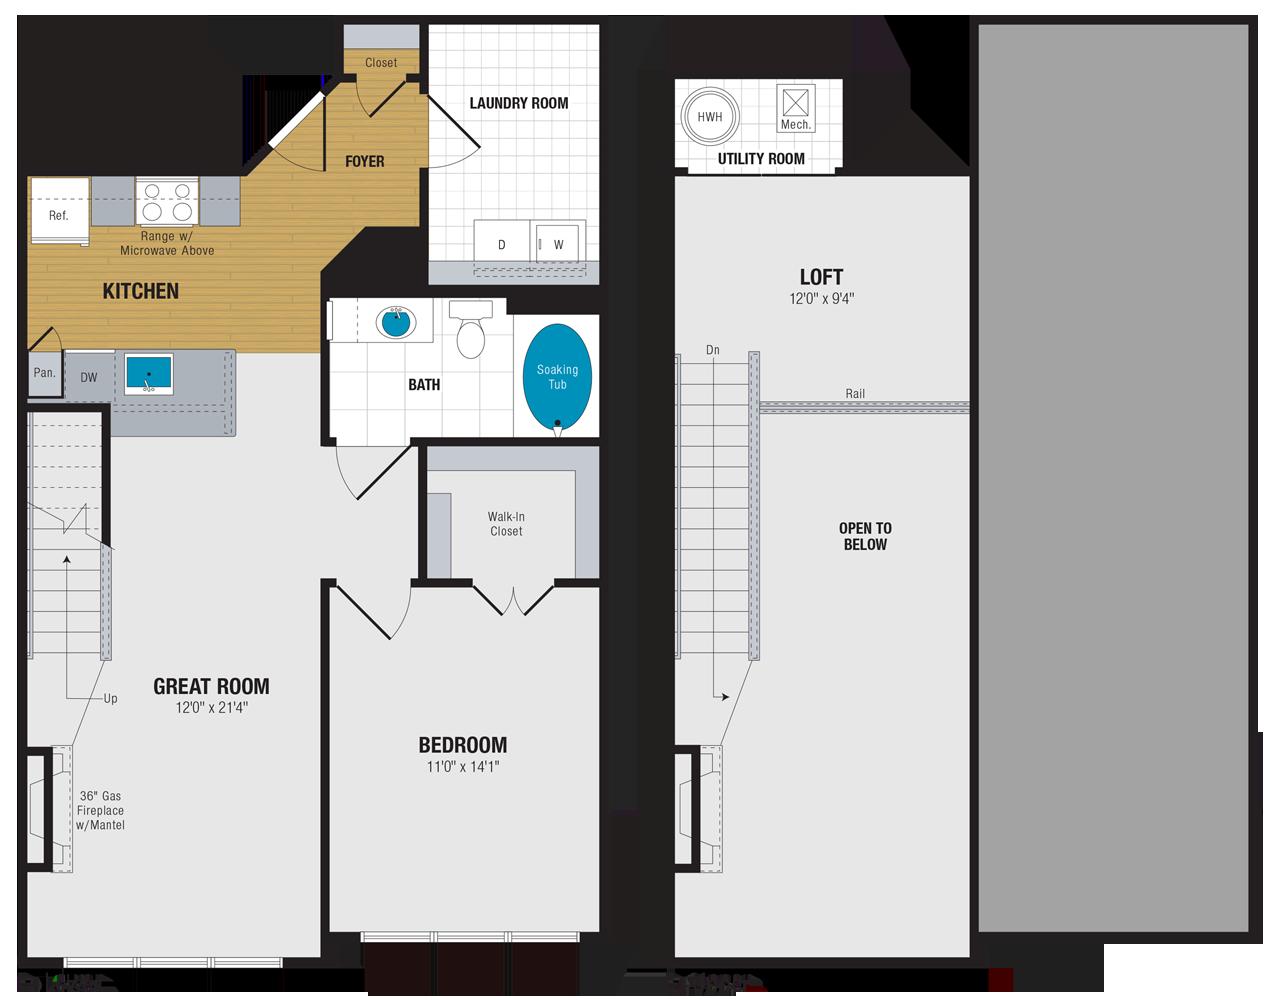 Md abingdon theenclaveatboxhill p0663789 34570722589848 2 floorplan